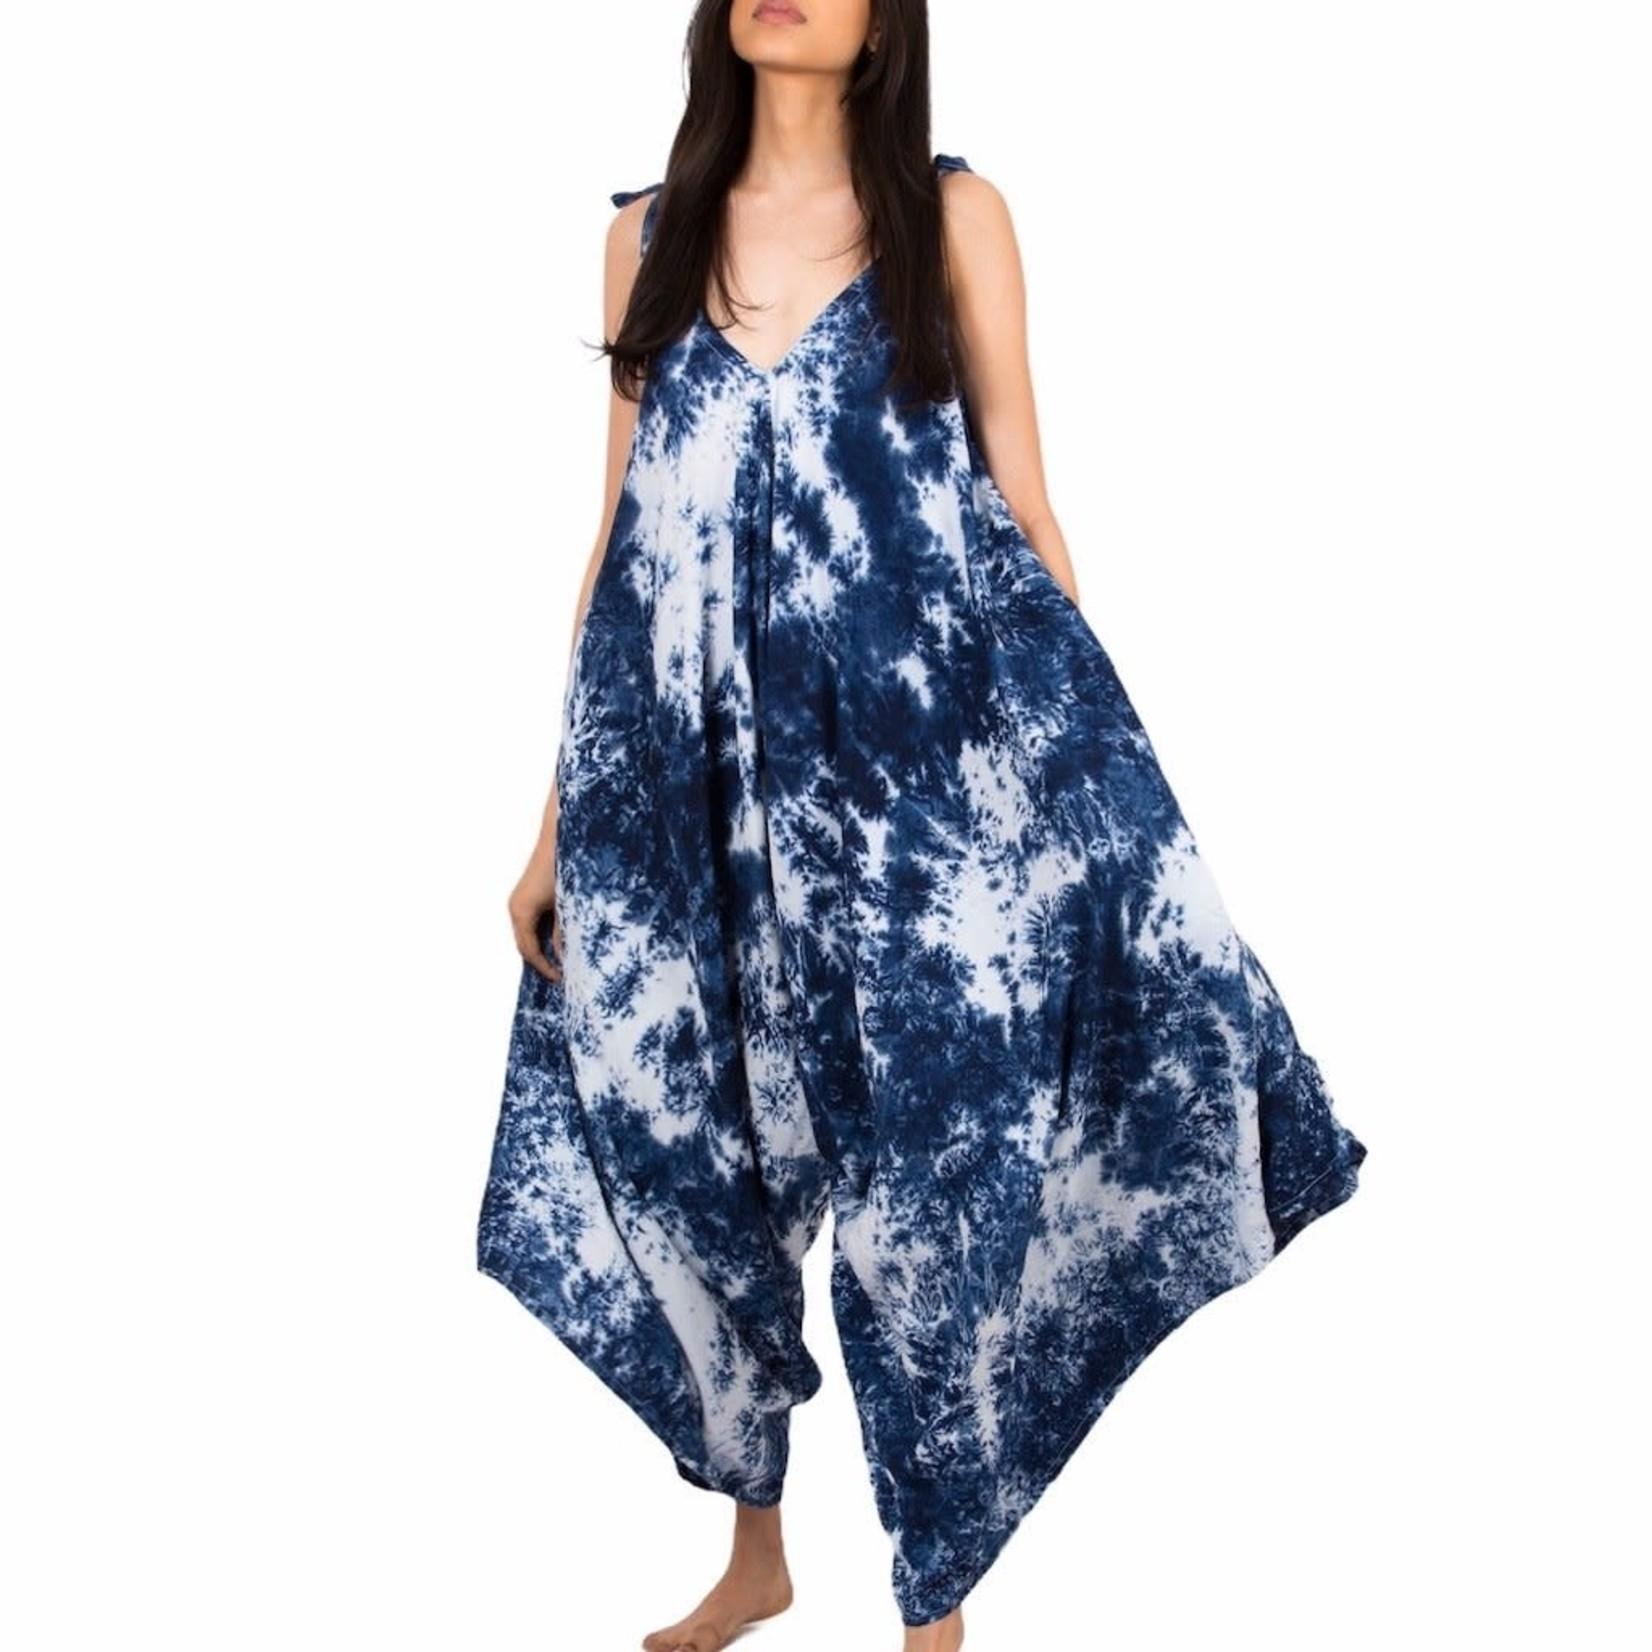 Suzie Blue Canada Blue Splash Motif Tie Dye Romper O/S